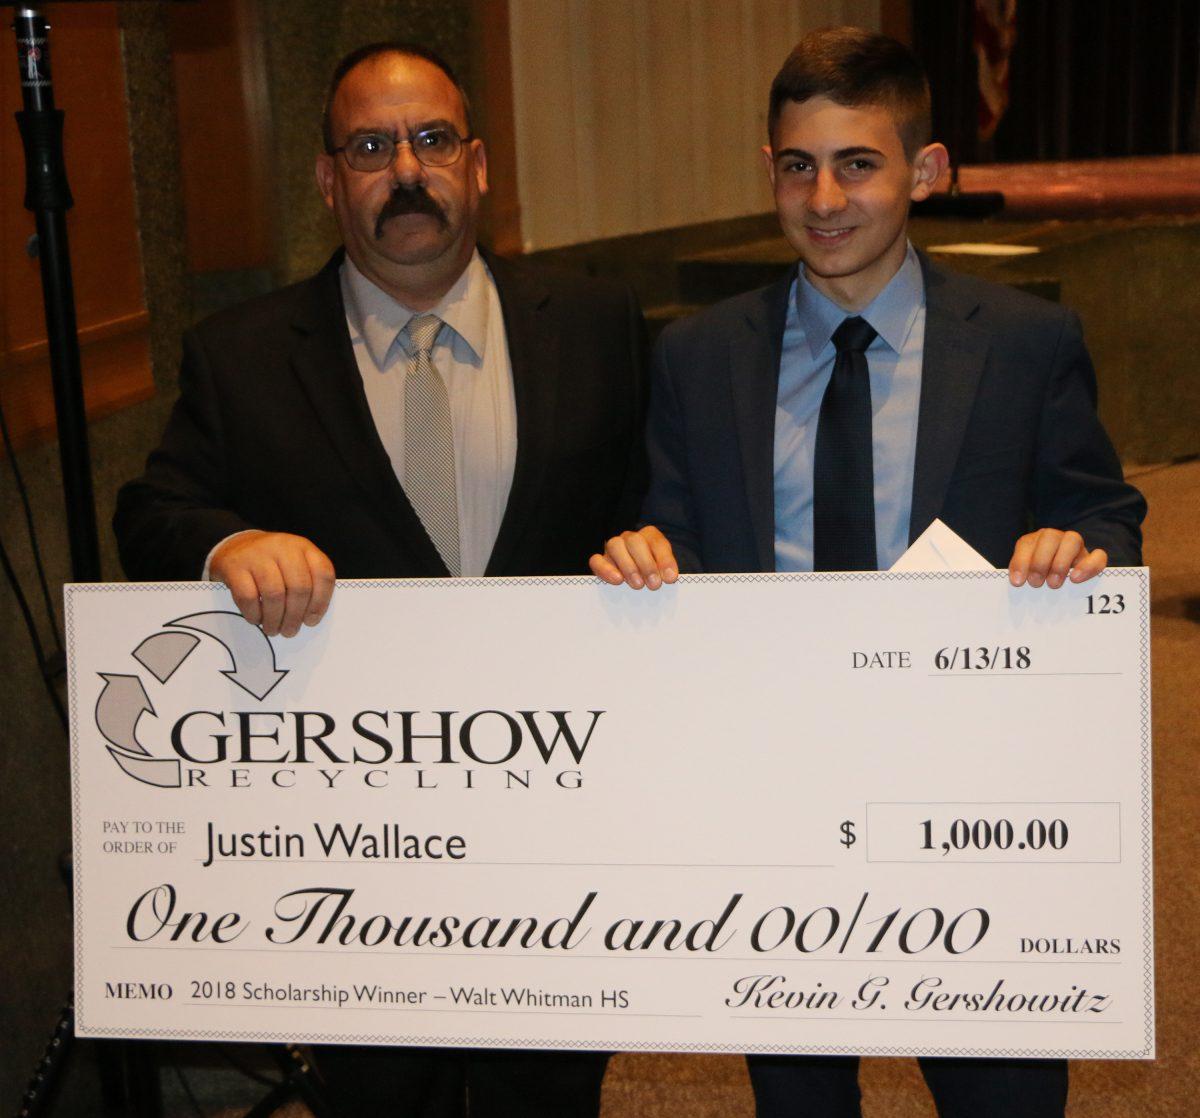 Gershow Recycling Grants Environmental Conservation Scholarship to Walt Whitman High School Graduating Senior Justin Wallace